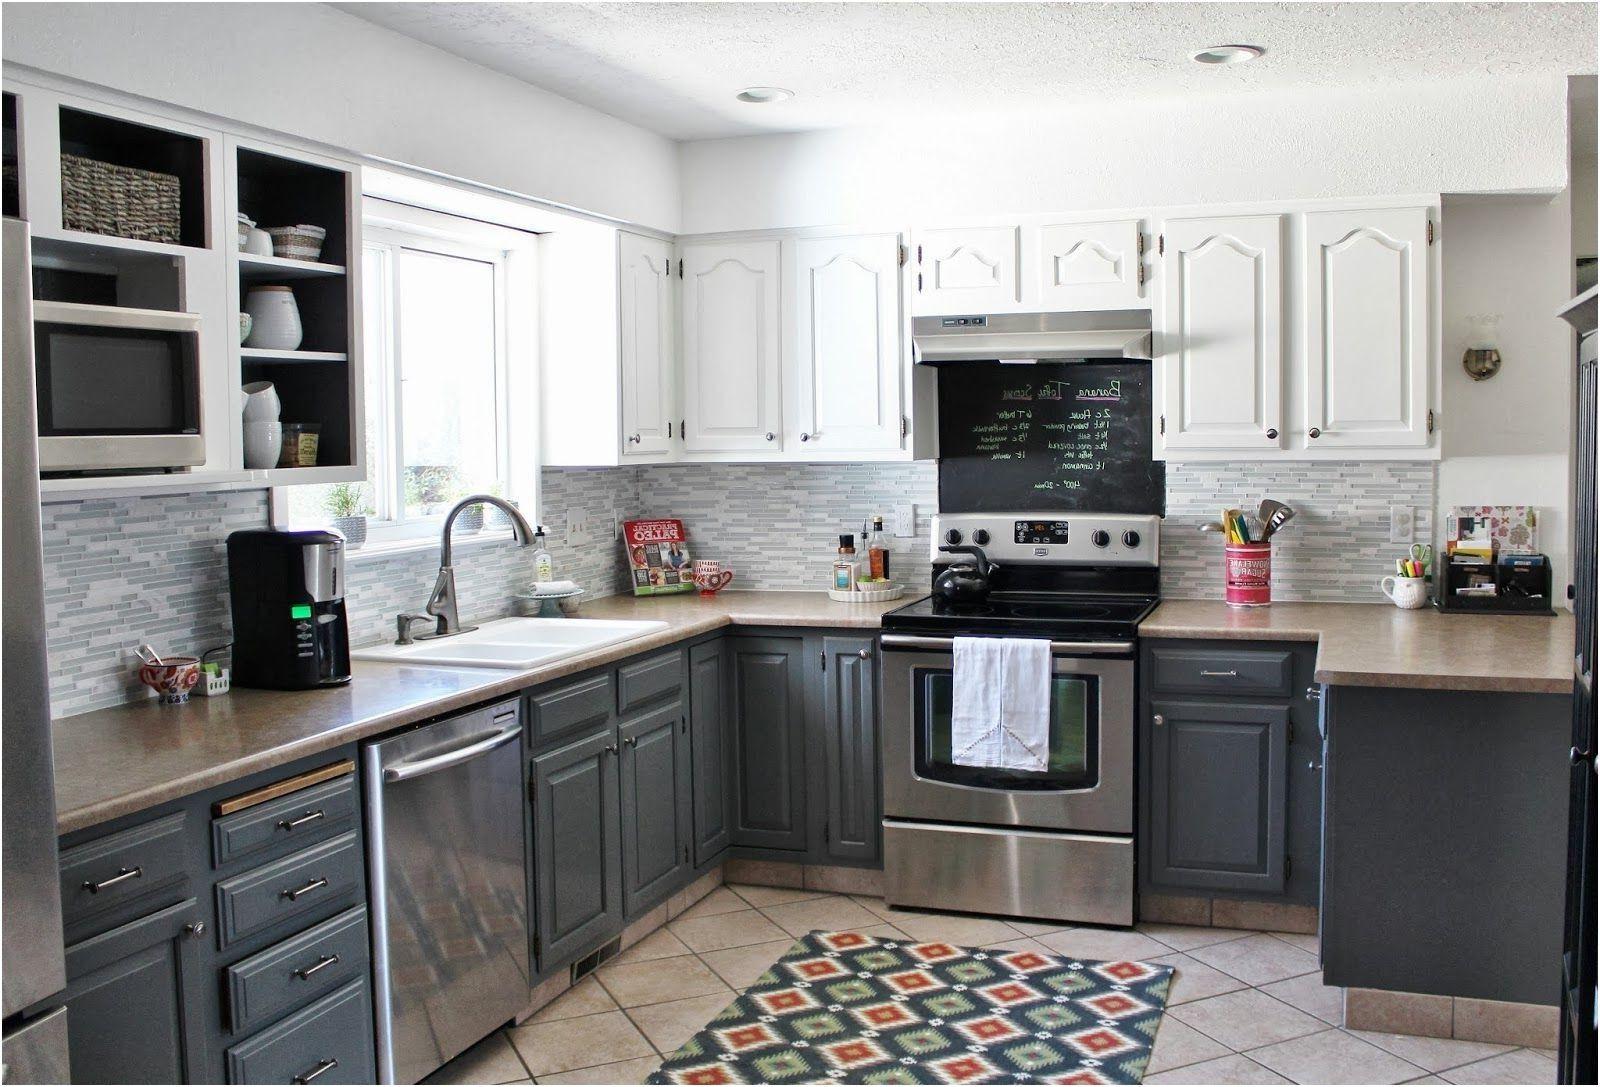 Kitchen Design White Cabinets Black Appliances From Kitchen Design Black A Cheap Kitchen Cabinets Kitchen Cabinets With Black Appliances White Kitchen Makeover